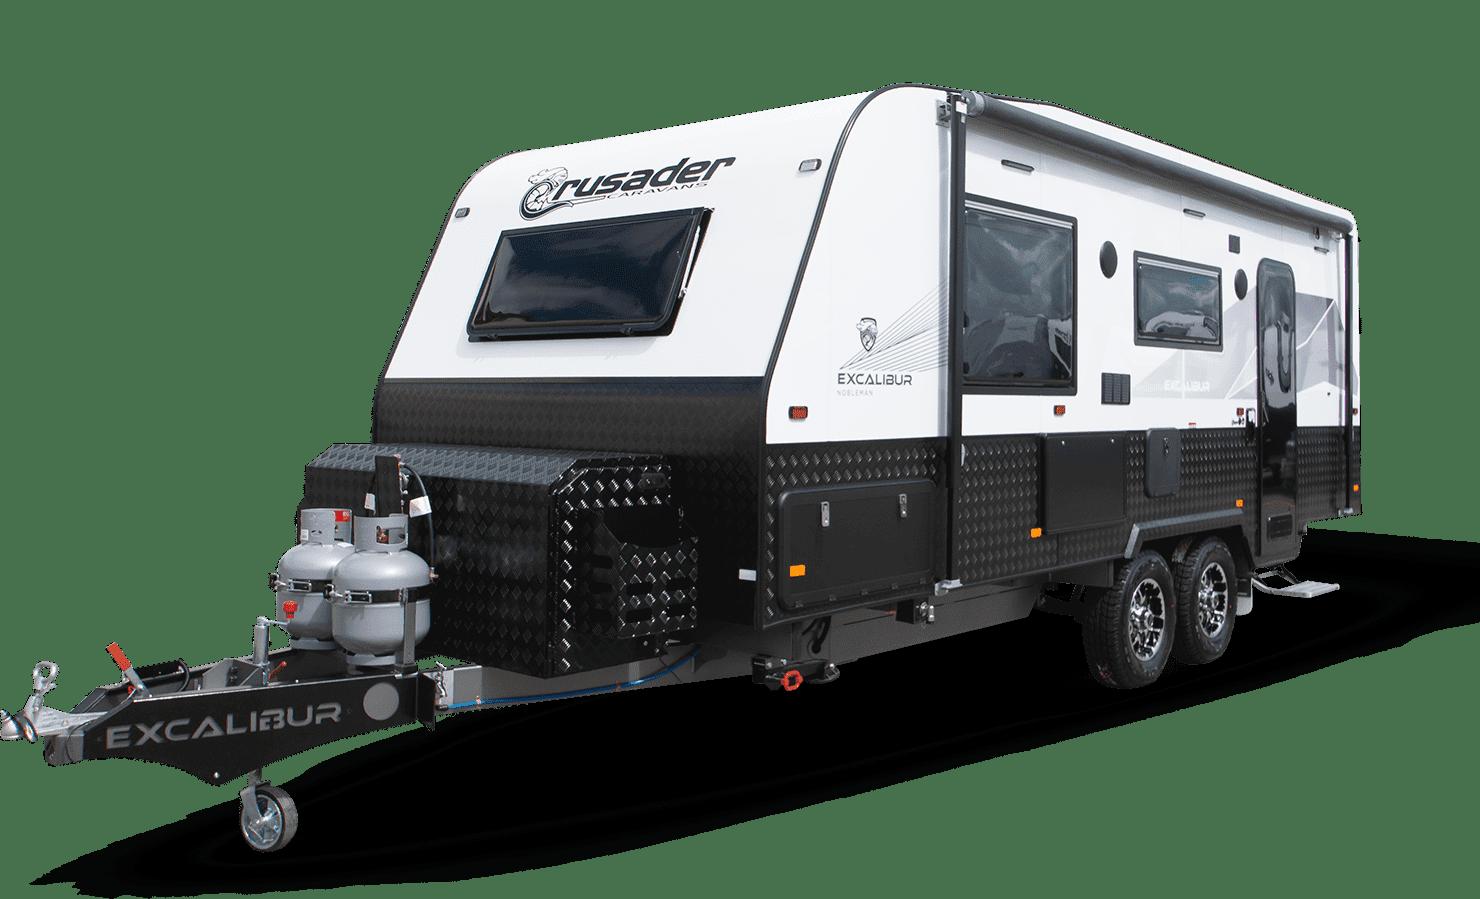 New Crusader Caravan Excalibur Nobleman for sale,